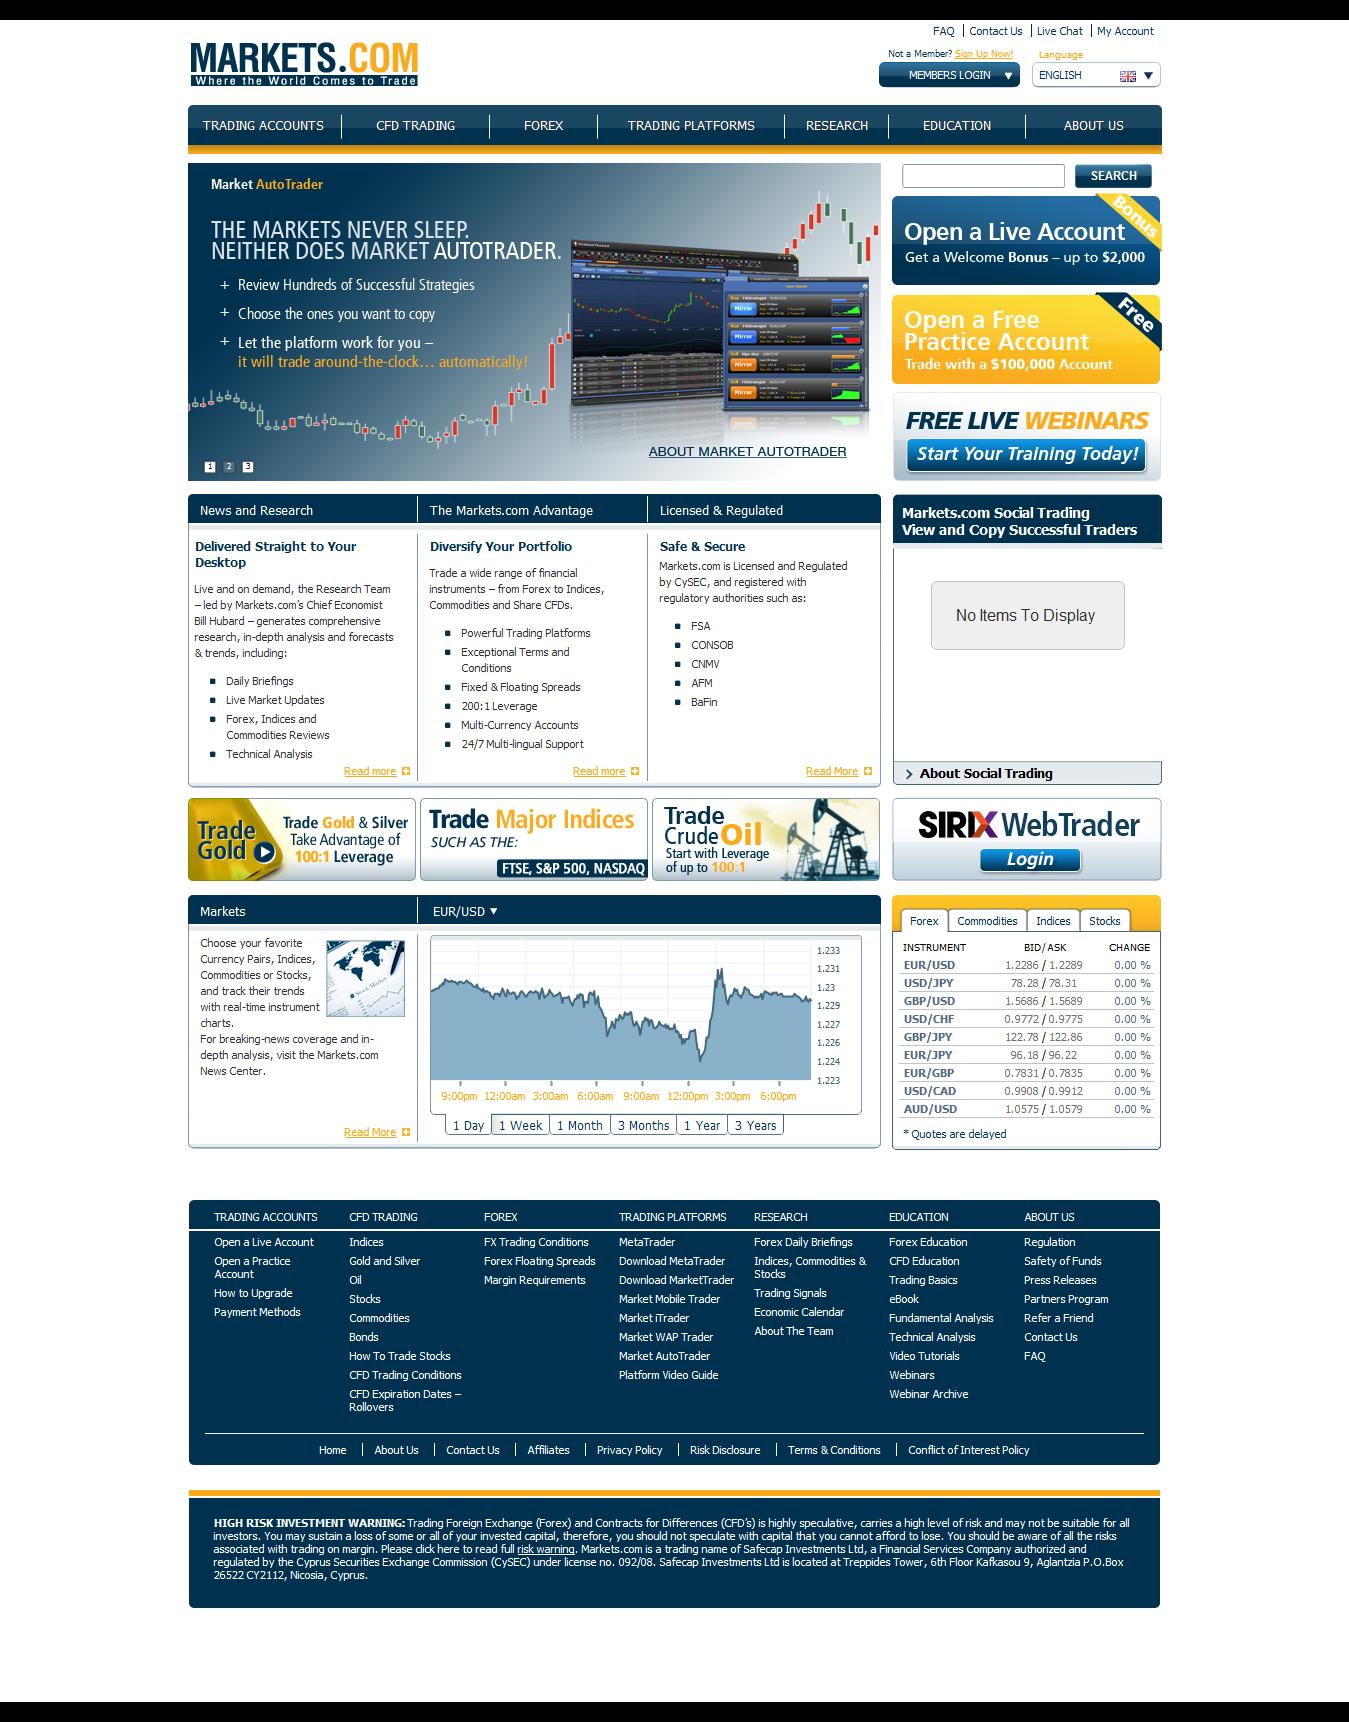 markets-com-forex-broker-rating Top 10 Forex Brokers